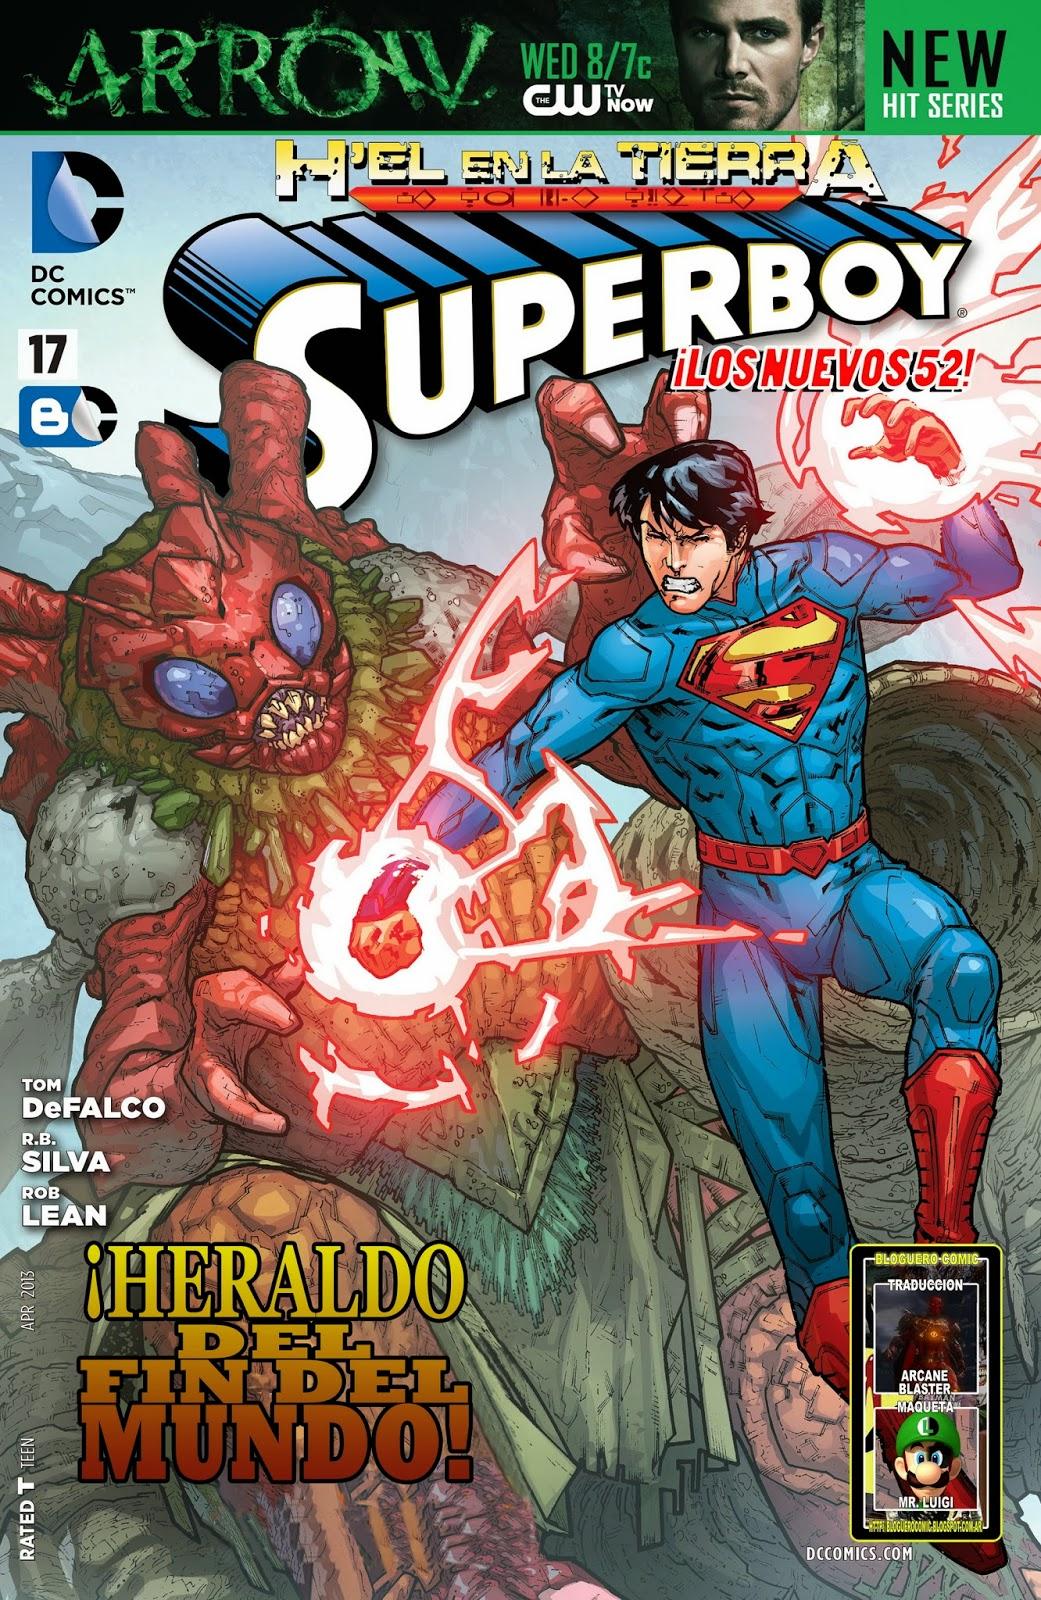 http://www.4shared.com/file/lAacO8Fs/Superboy_17__Bloguero_Arcane_B.html